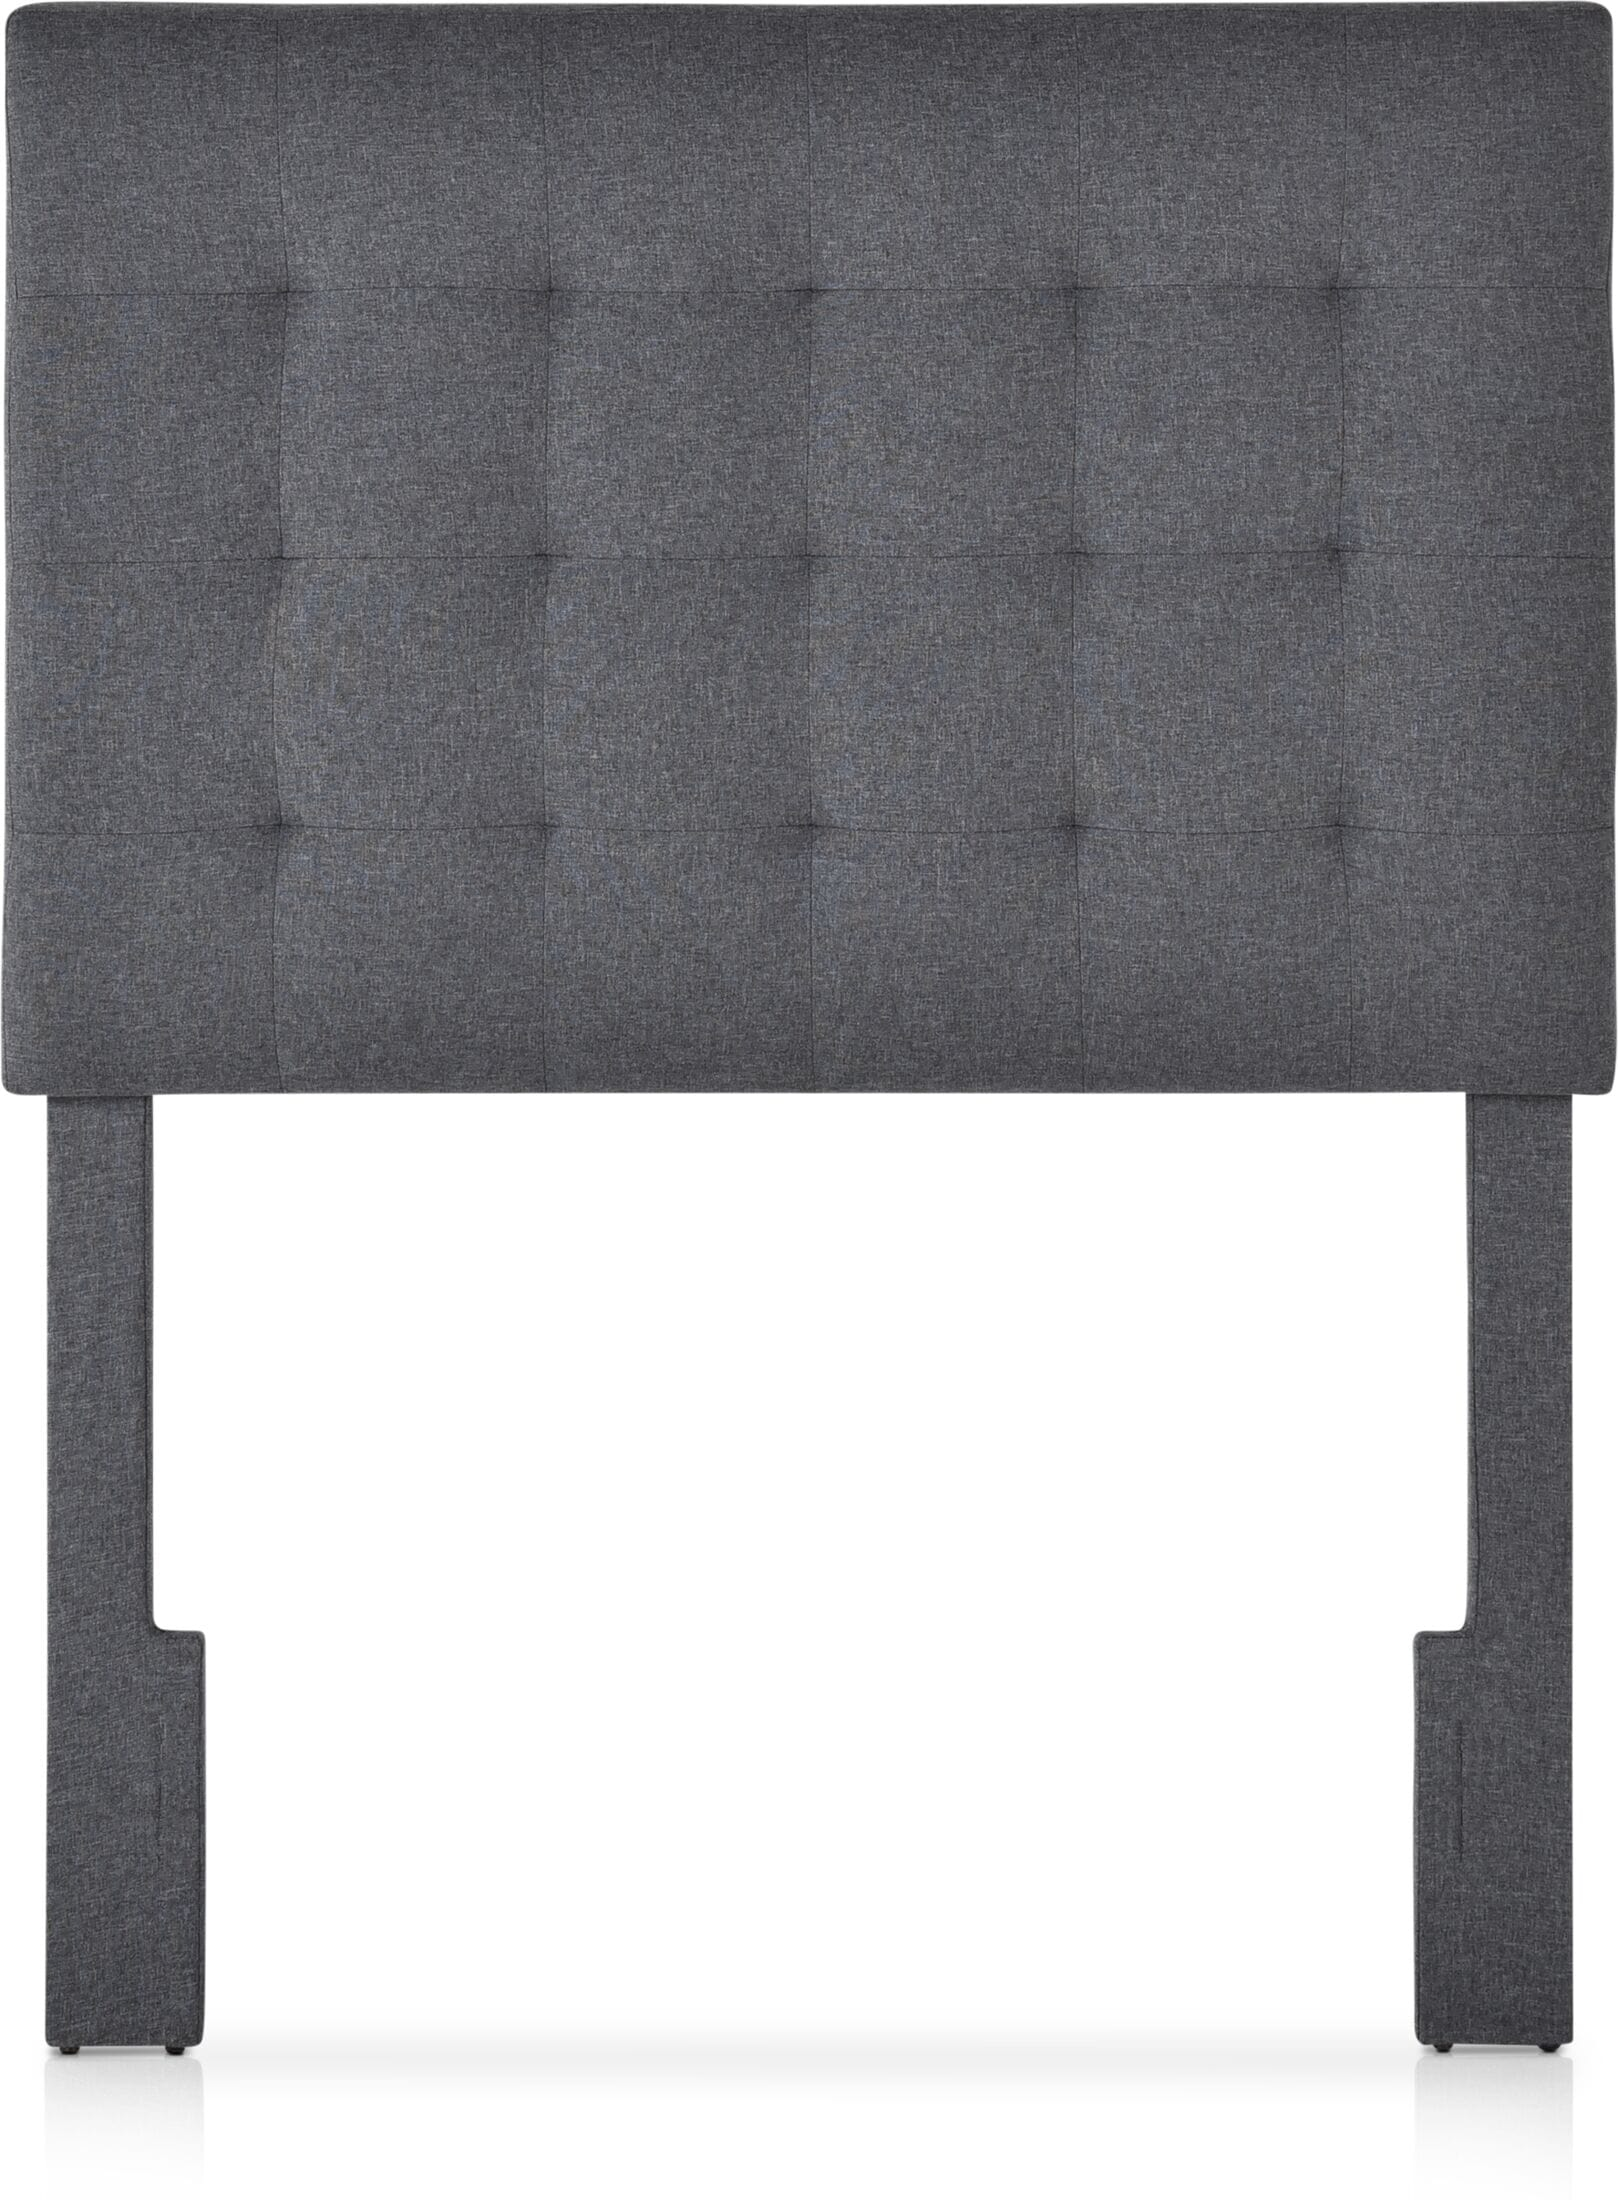 Bedroom Furniture - Astrid Upholstered Headboard